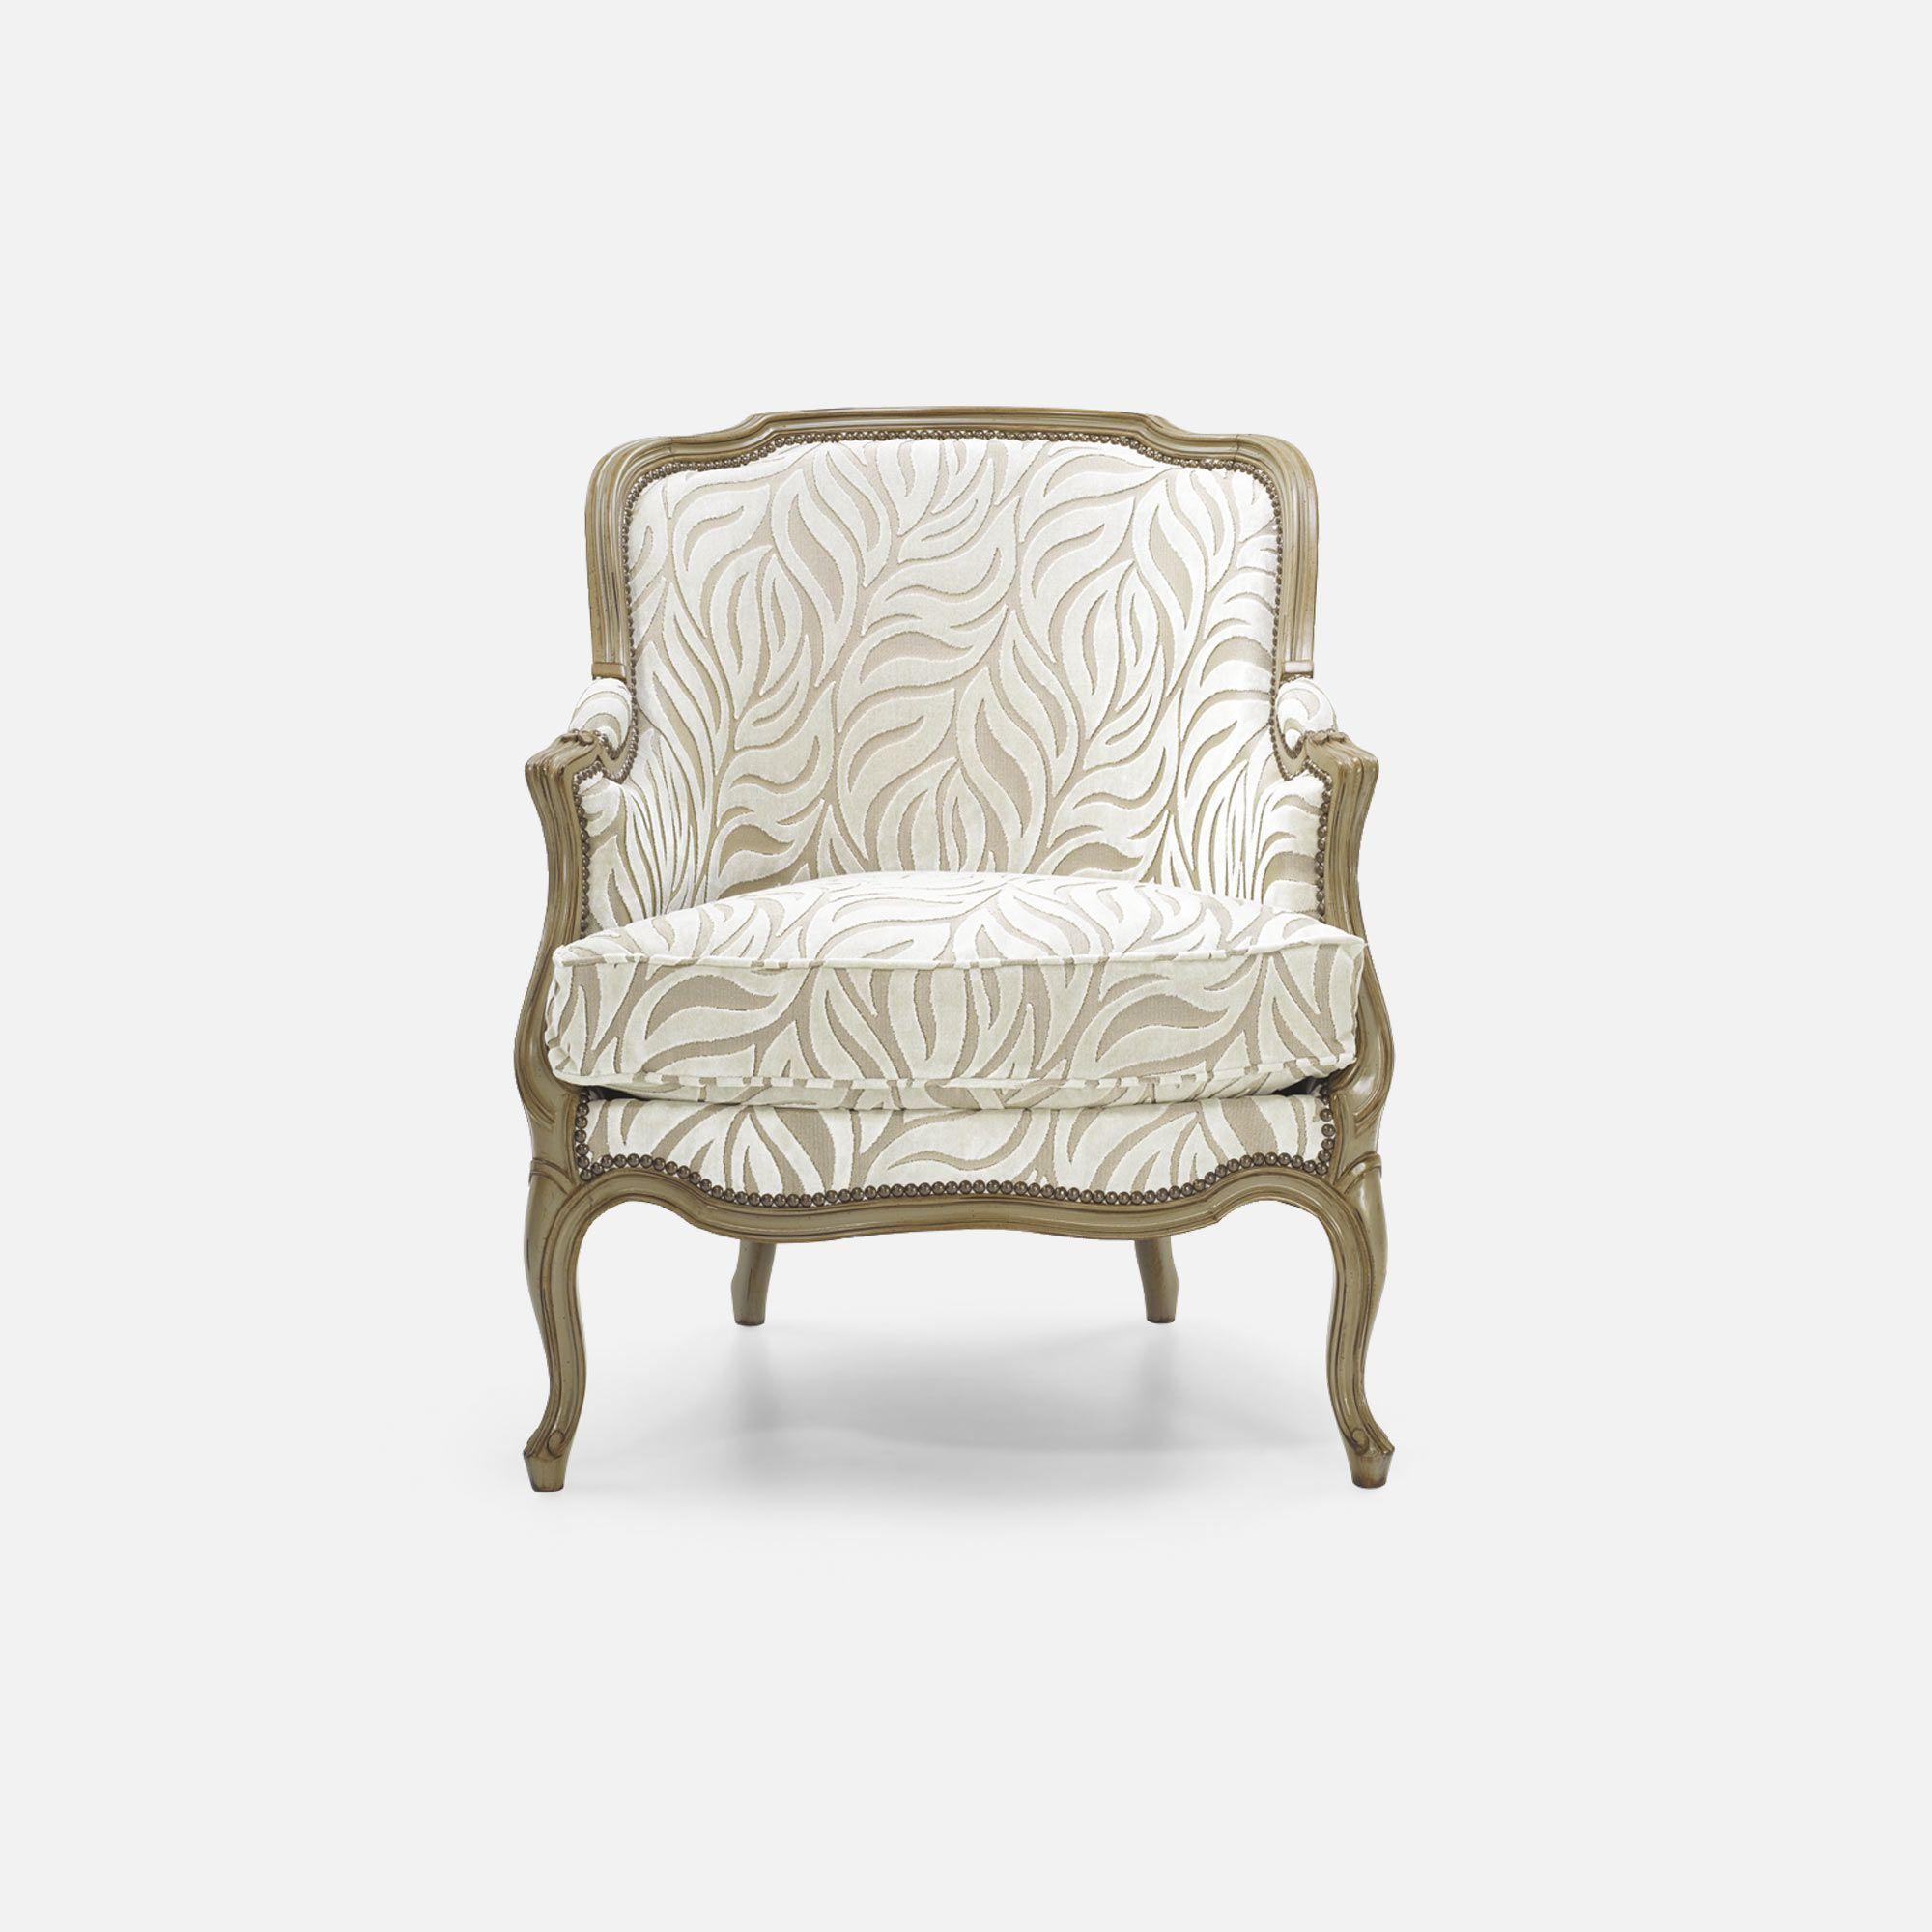 Bergere chair for Hotel restaurant bar Louis XV Corbeille